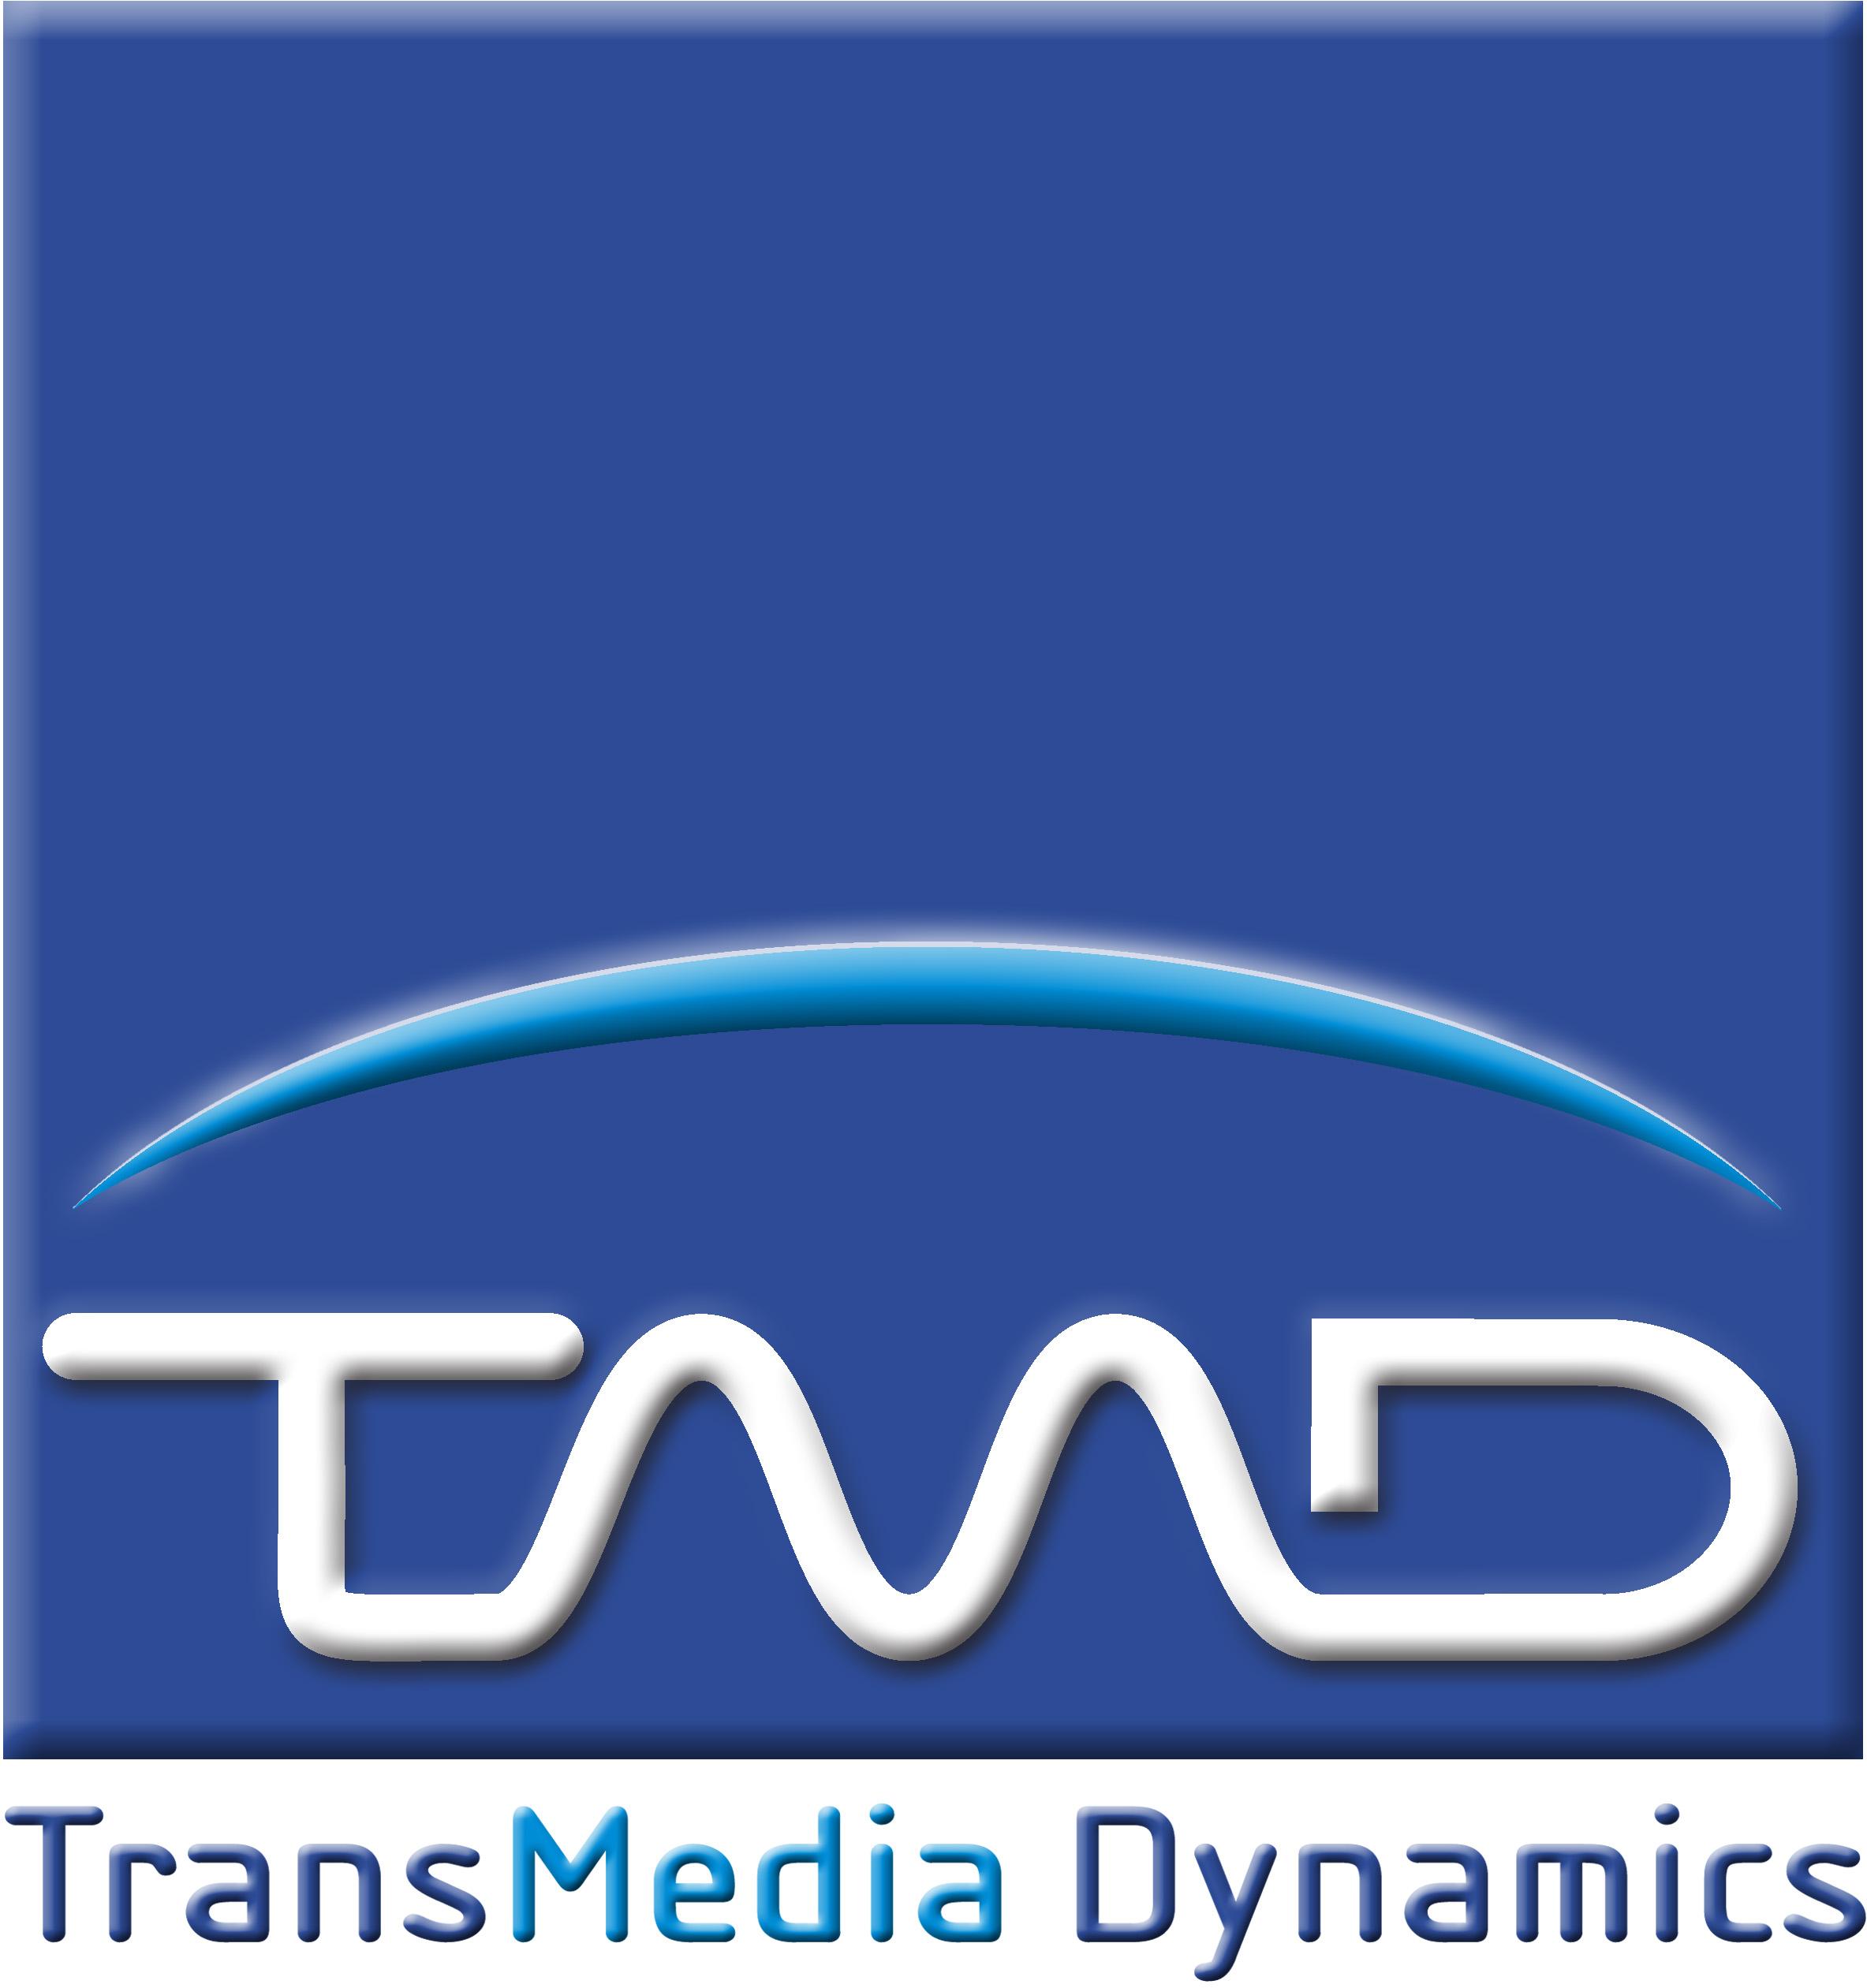 TransMedia Dynamics logo